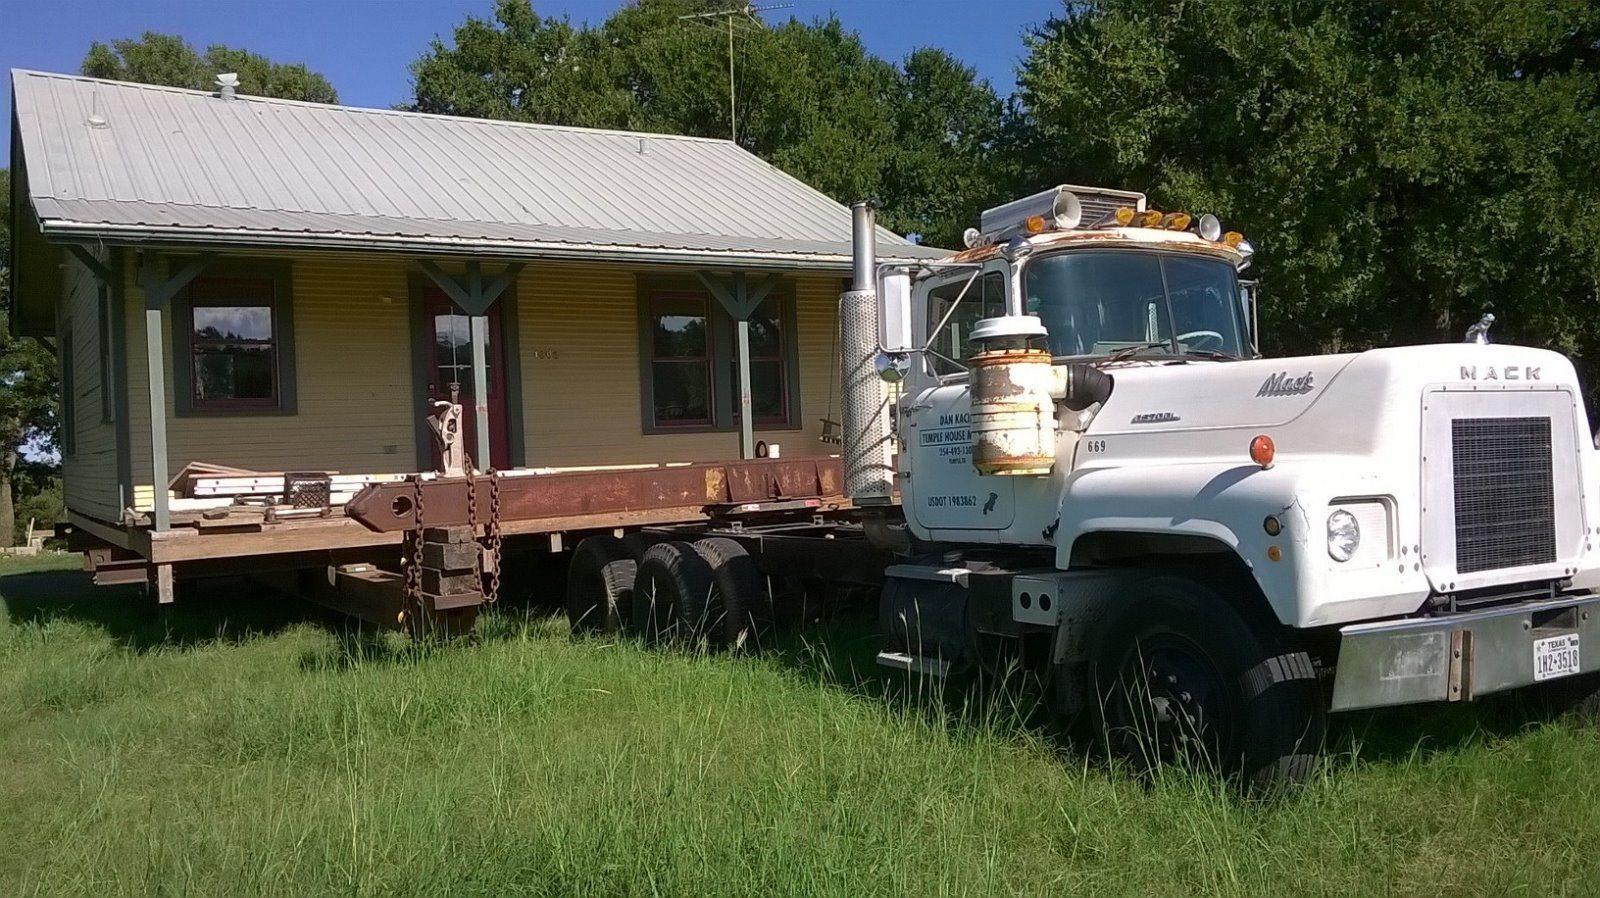 rs700l in texas trucks for sale. Black Bedroom Furniture Sets. Home Design Ideas